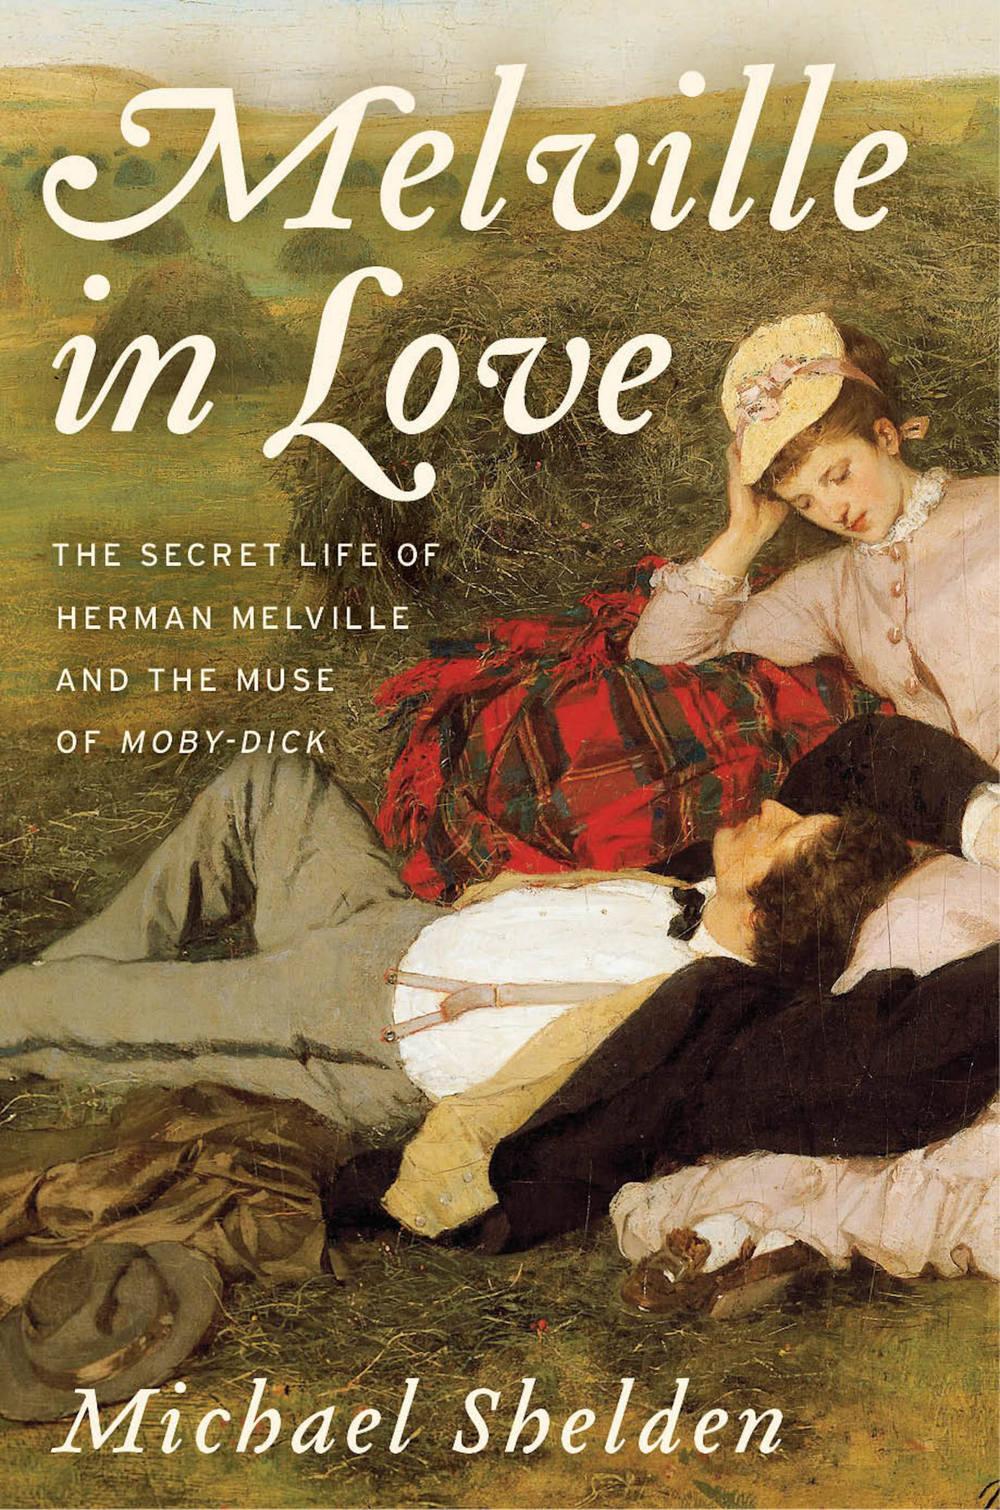 MelvilleinLove_cover.jpg